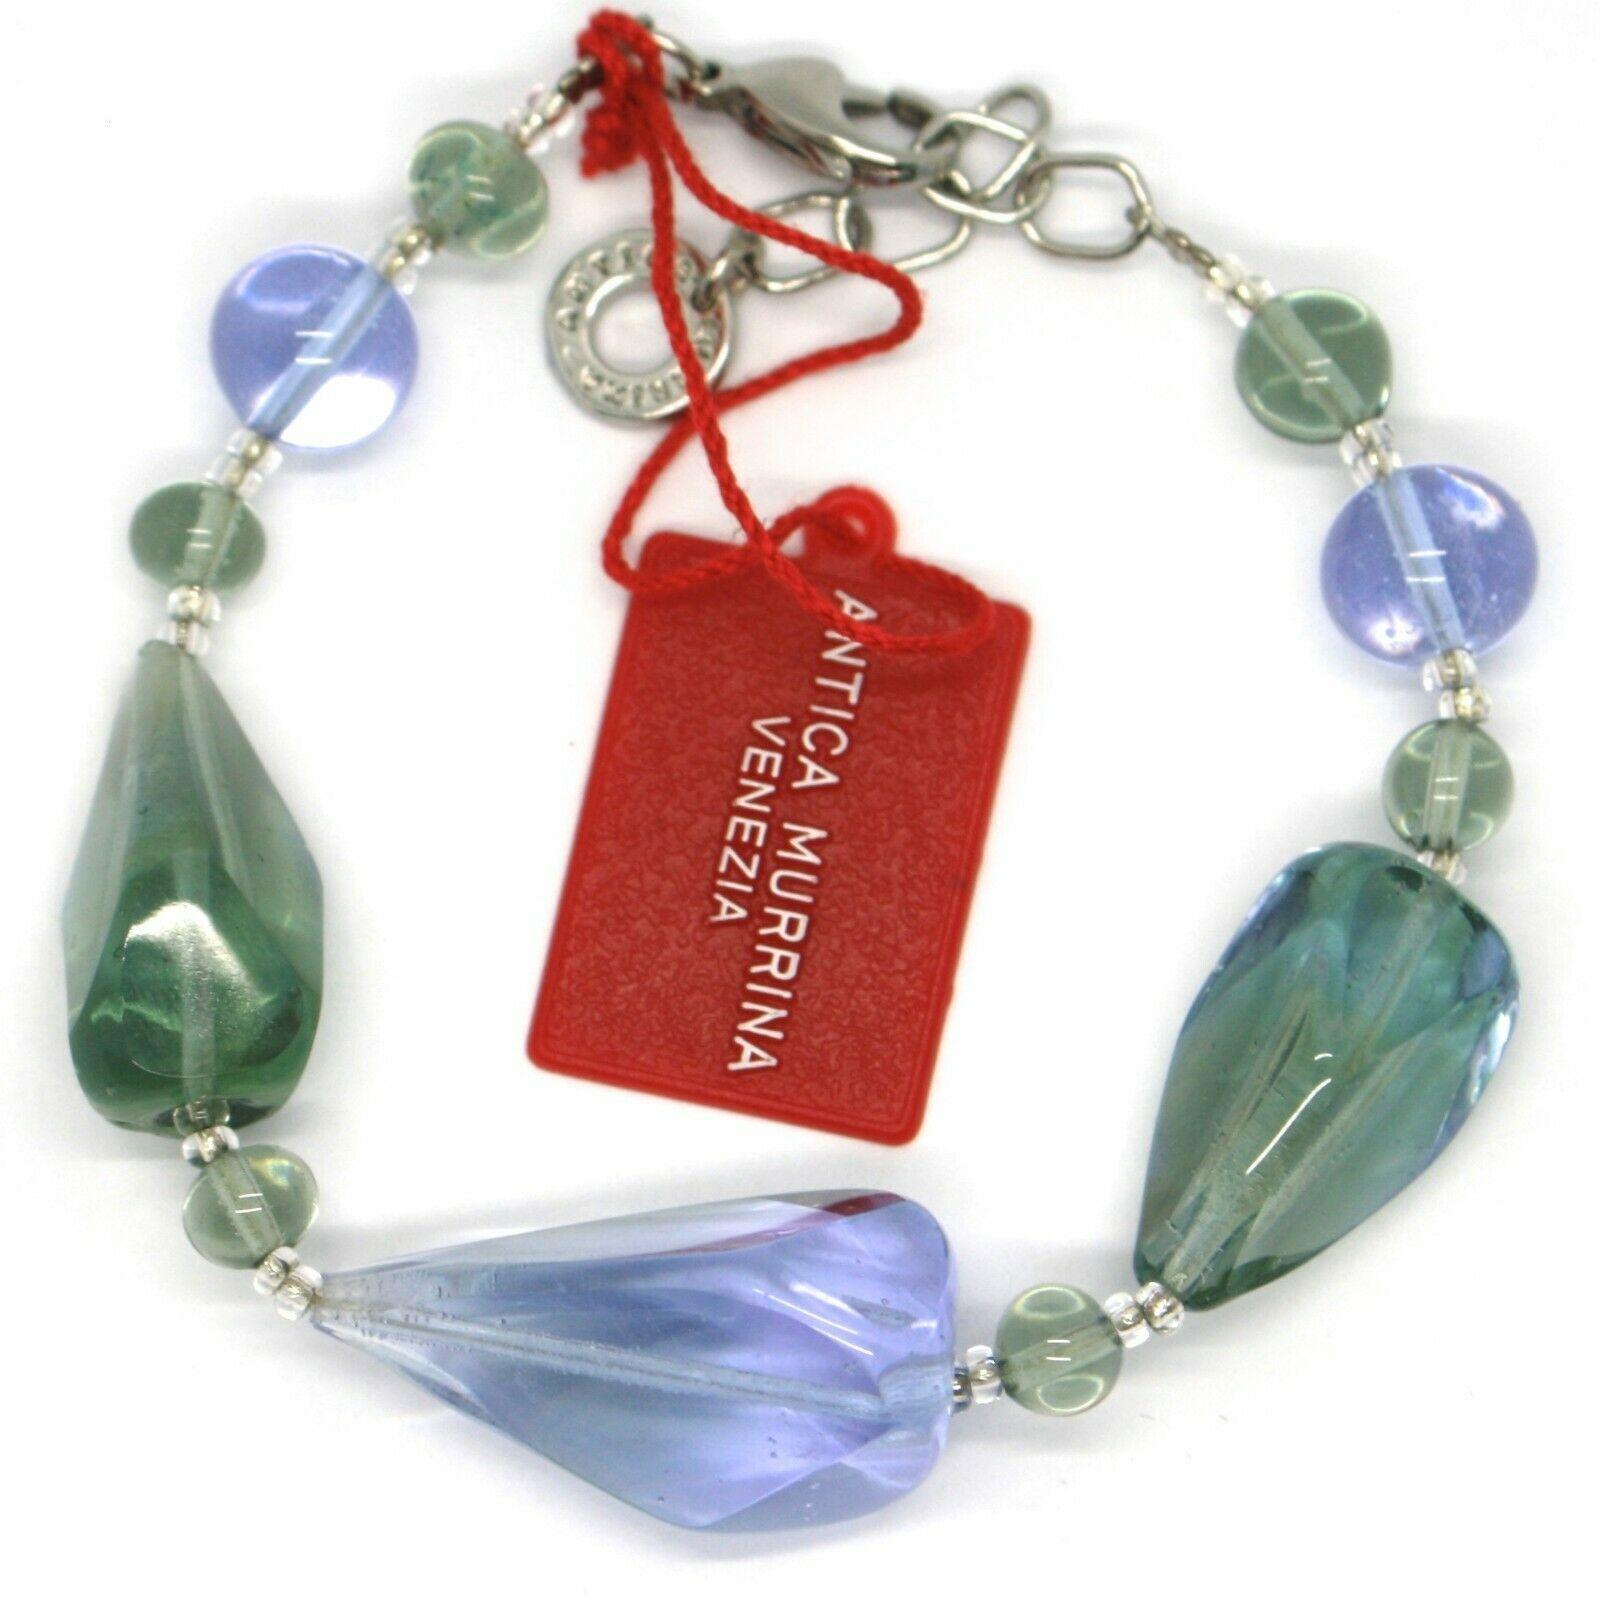 Bracelet Antica Murrina Venezia, Glass Murano, BR513A12, Drops, Green Light Blue